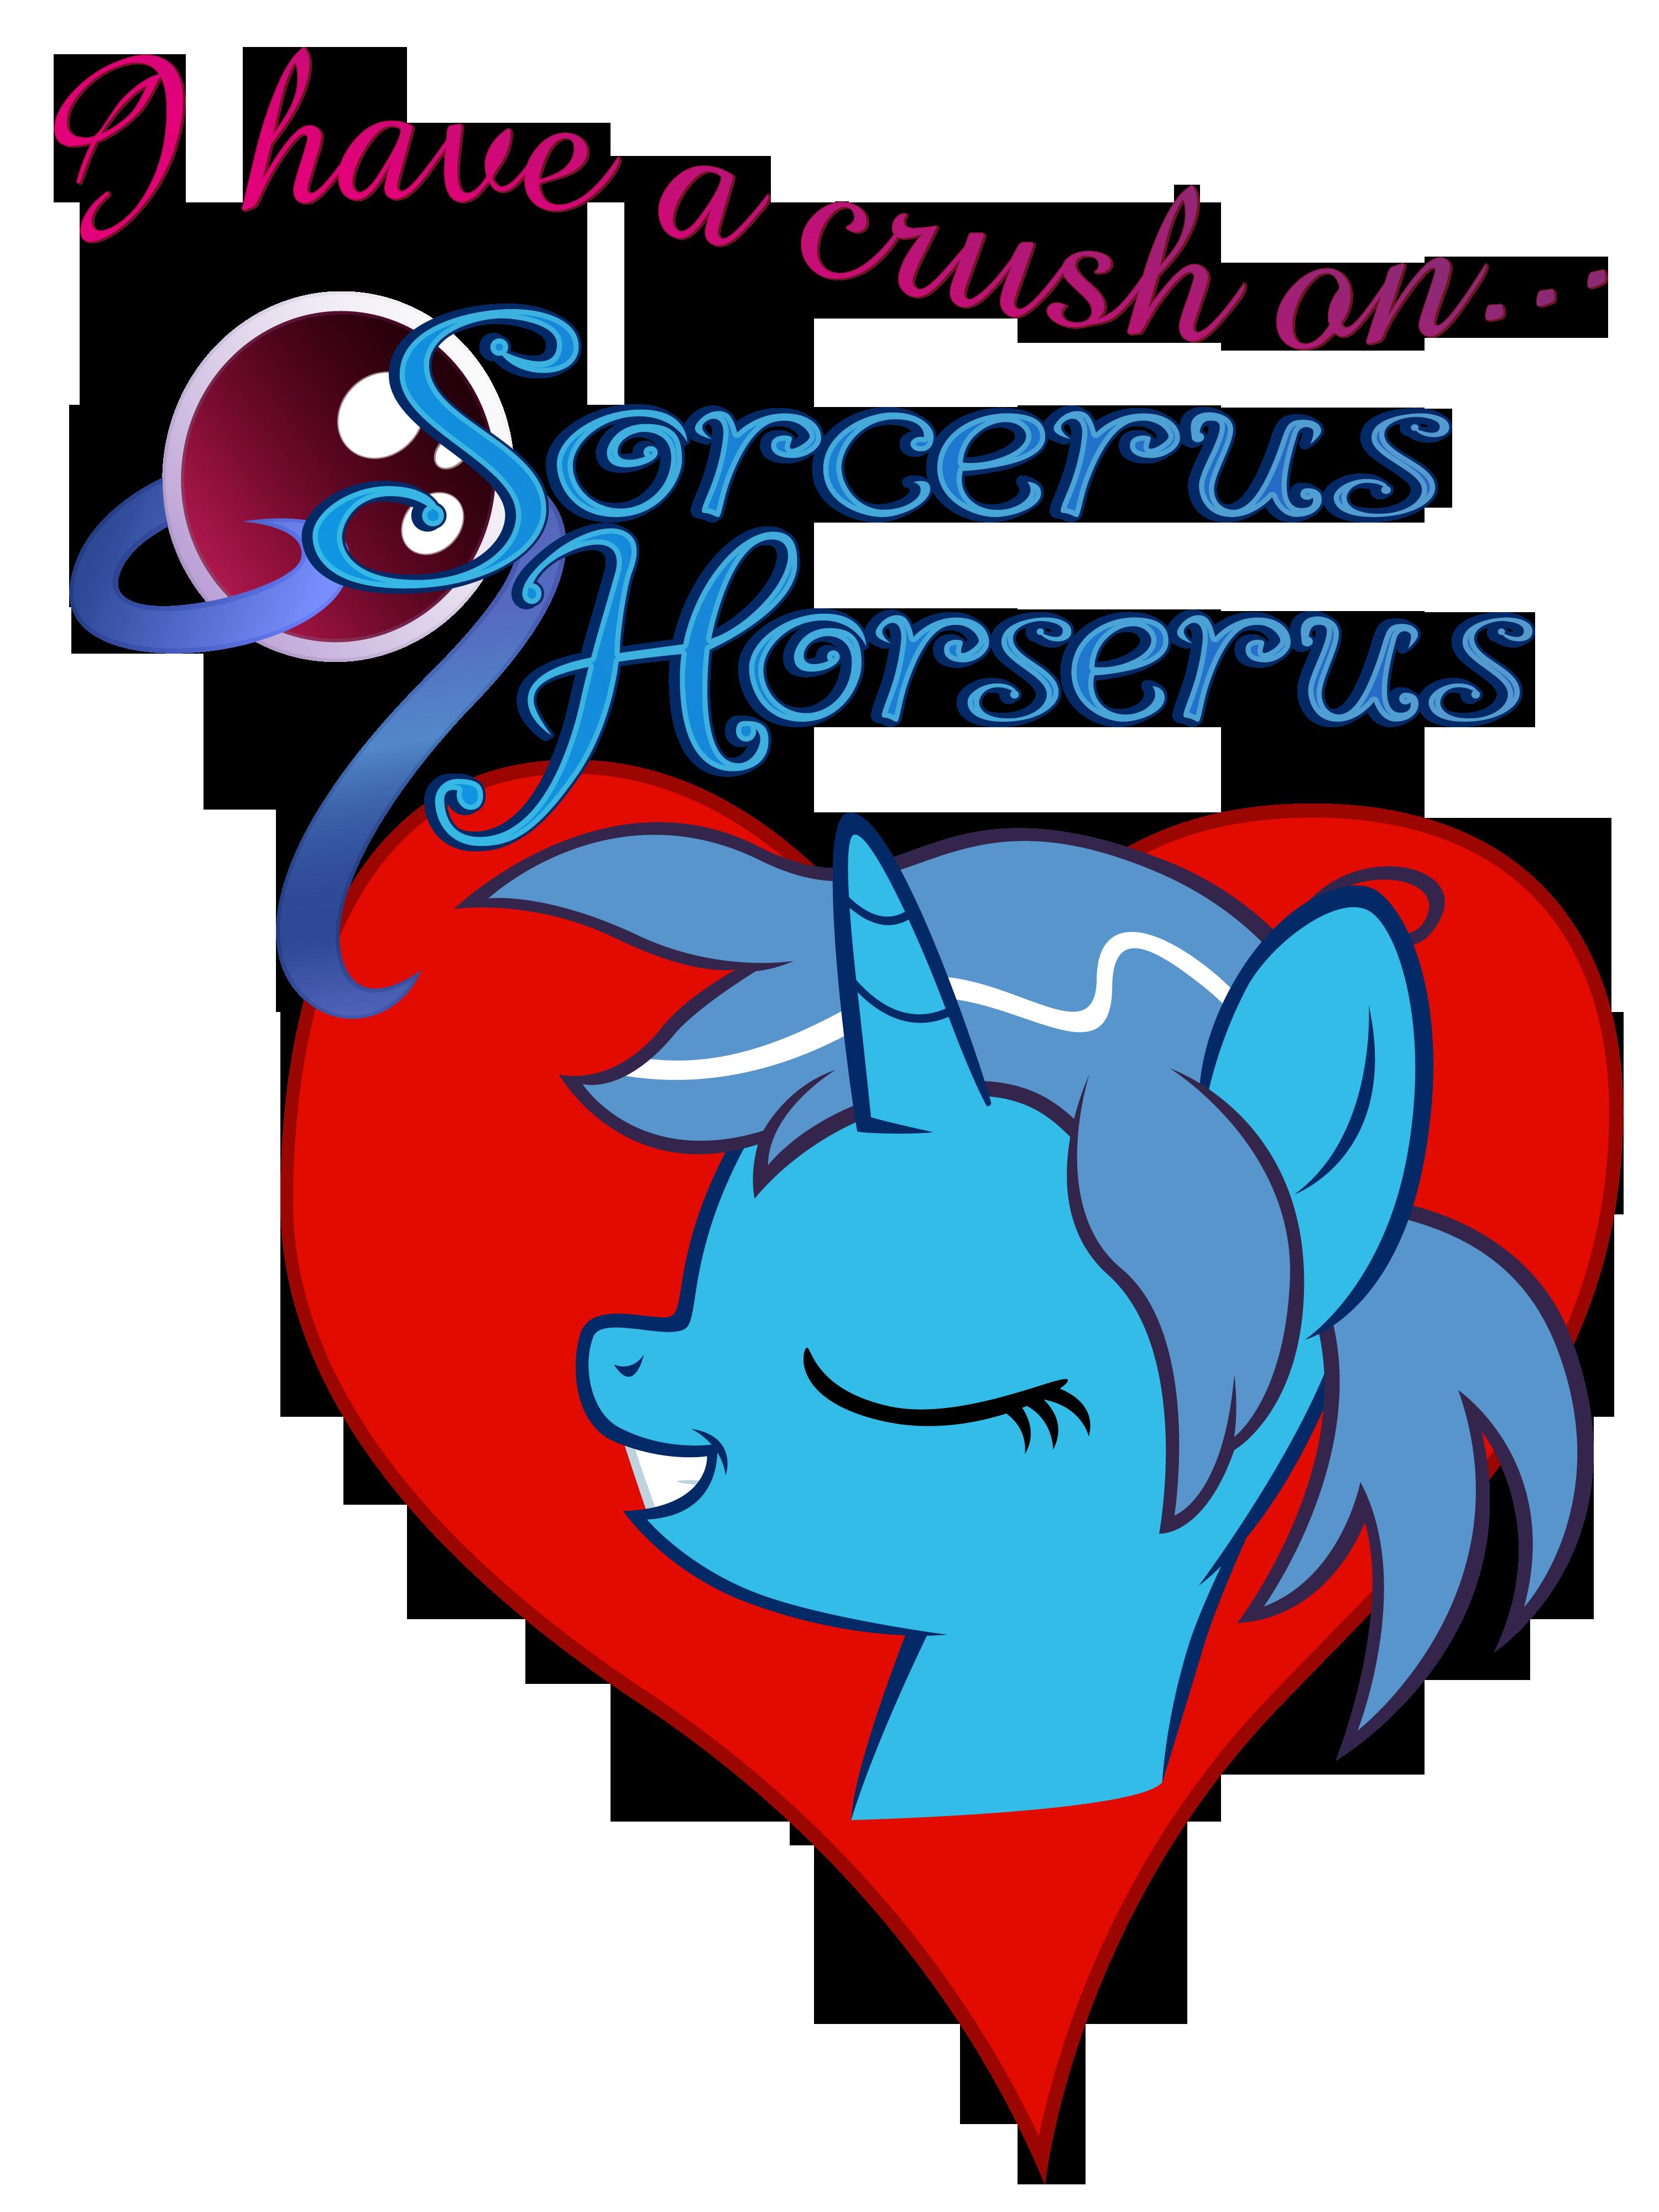 I heart SorcerusHorserus by Stinkehund